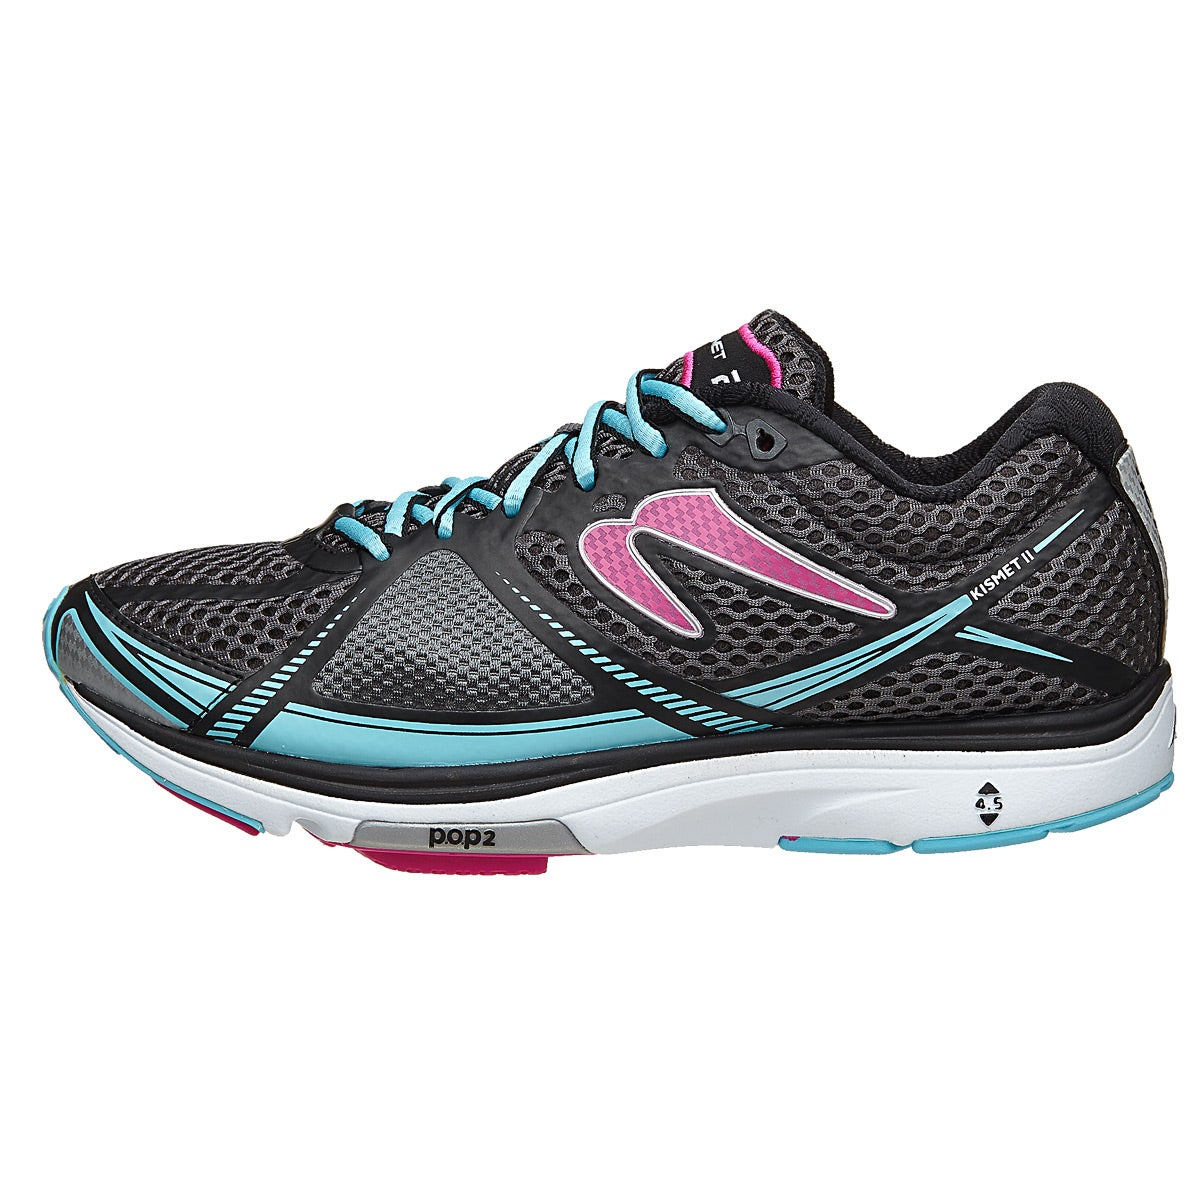 Newton Kismet II Women's Shoes Black/Pink 360° View